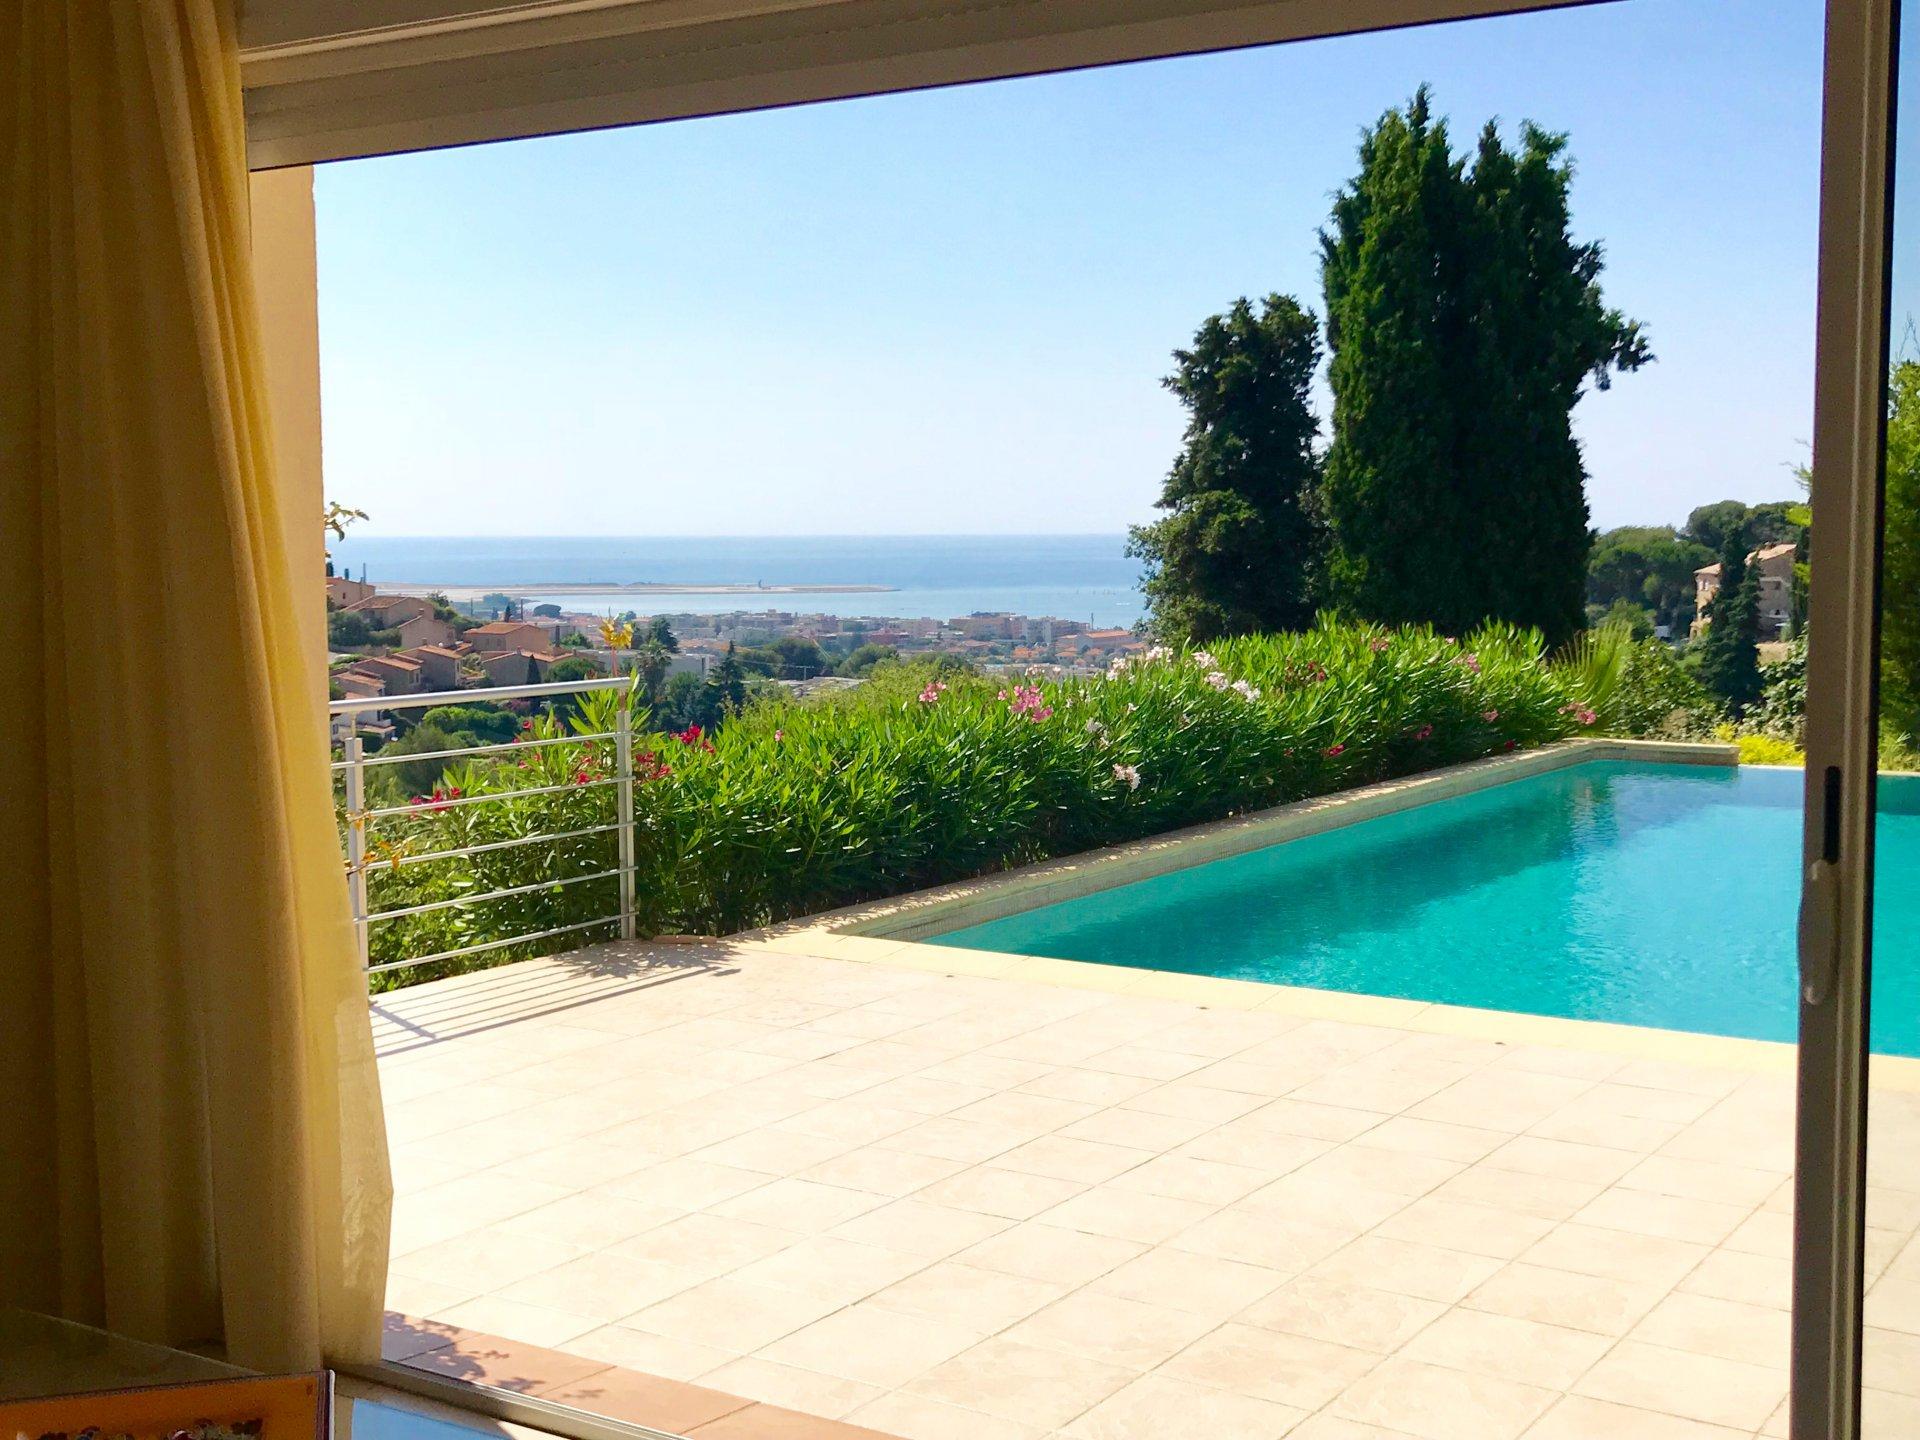 Villa 7P - 200m2 Cagnes sur Mer - GROS BUAUX (06800)